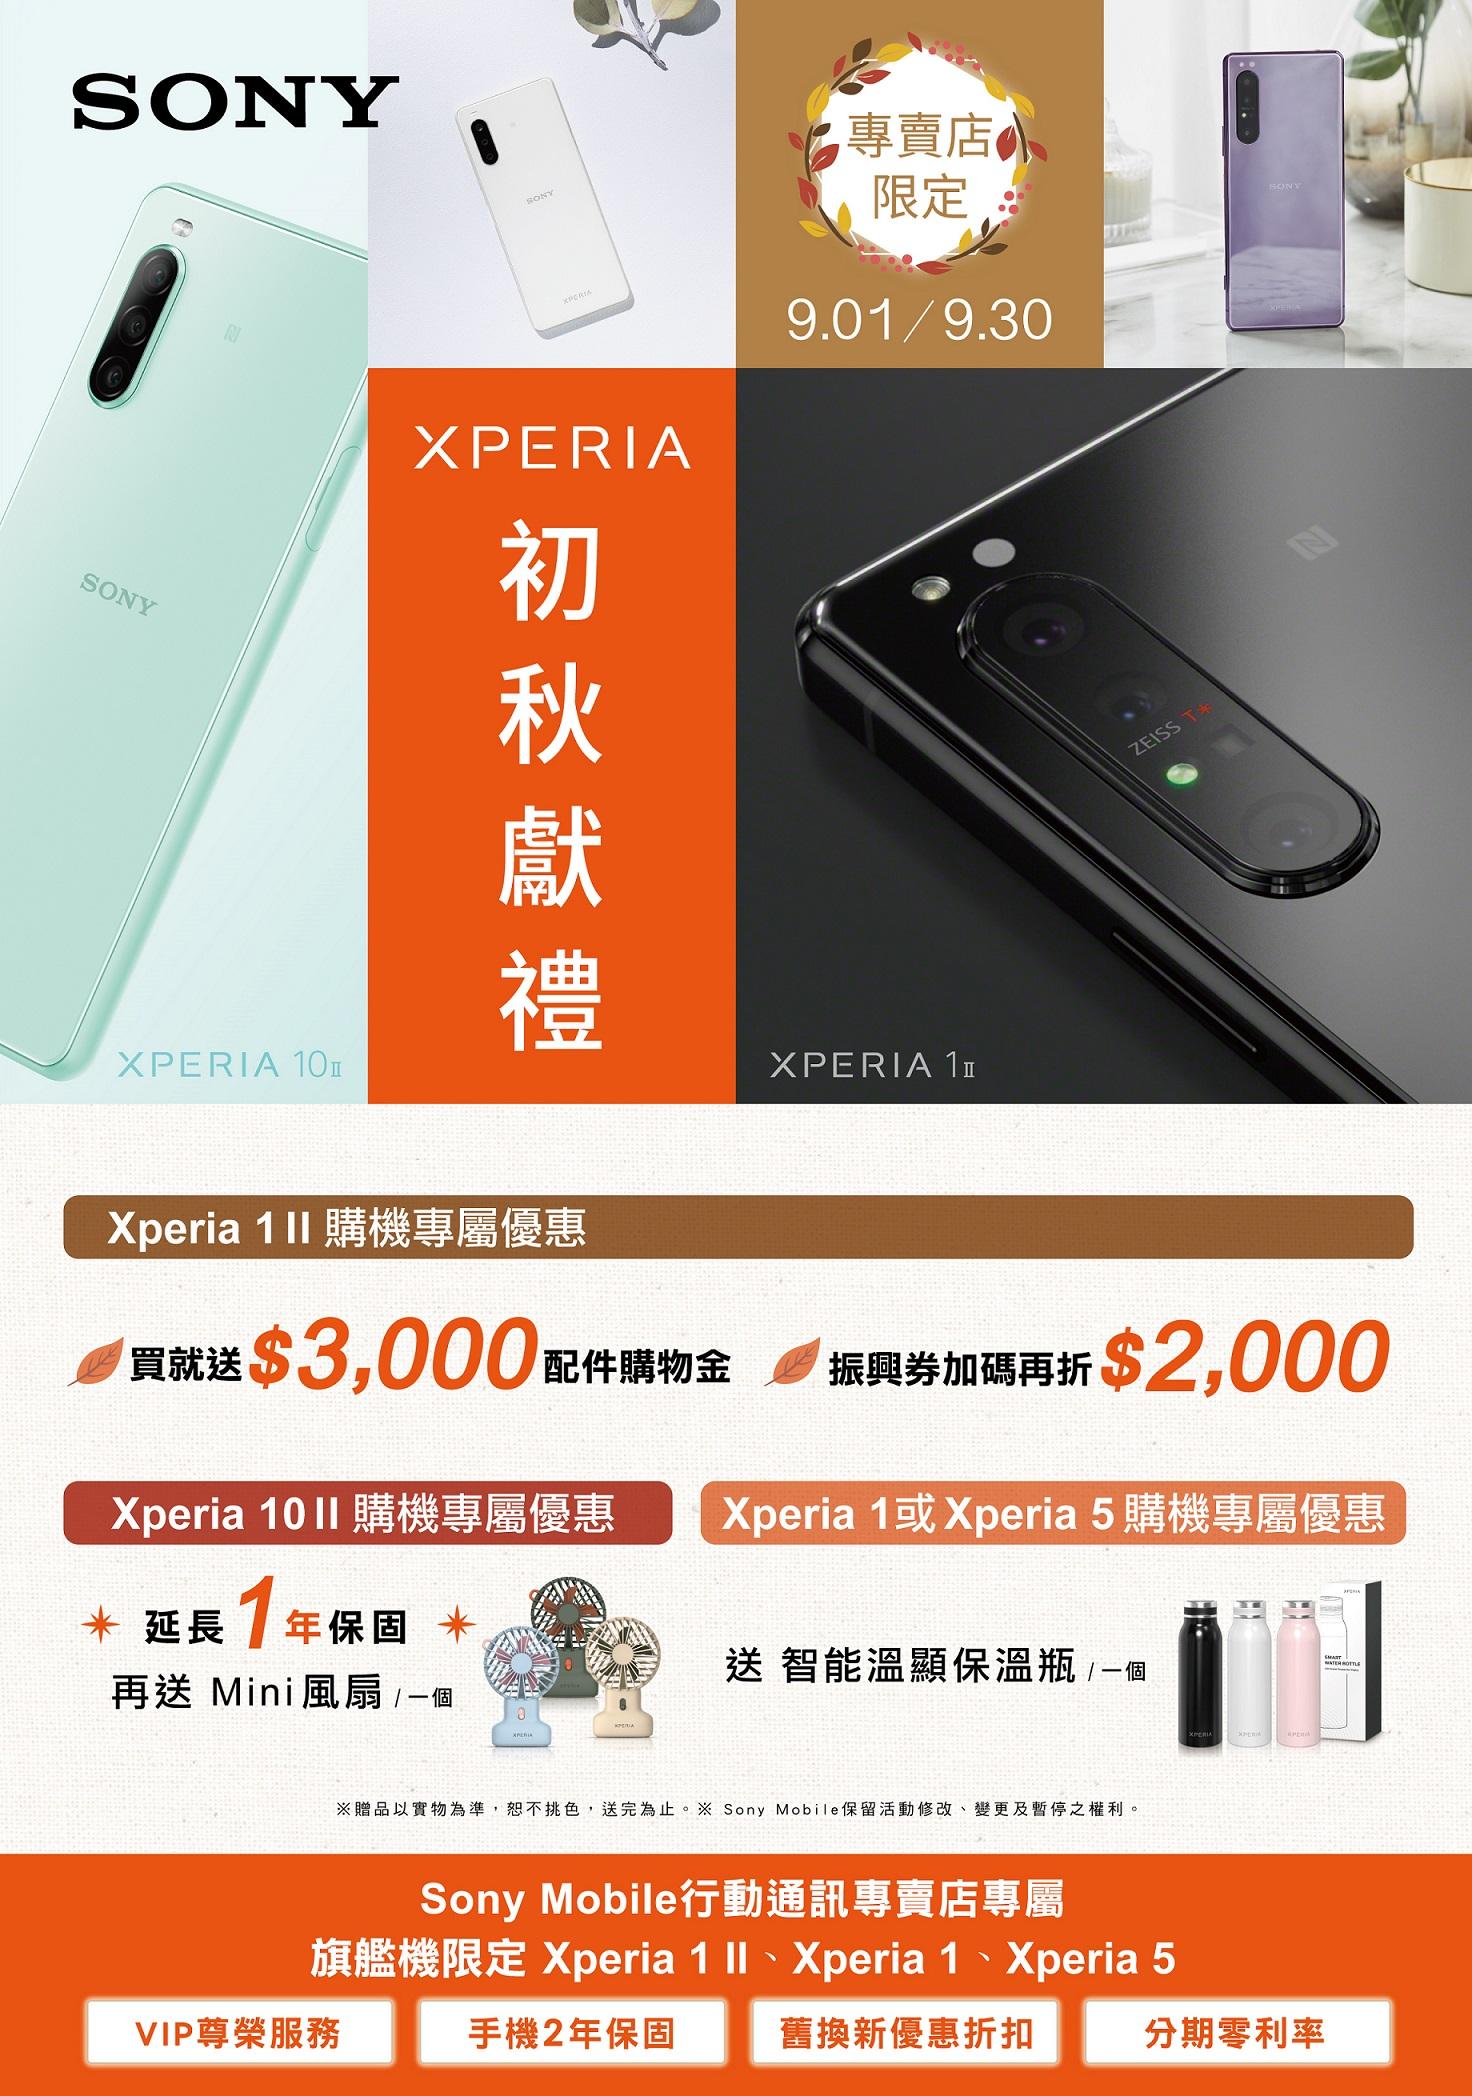 Sony Mobile初秋獻禮感恩回饋,Xperia 1 II稱霸Android旗艦、5G手機銷售雙冠軍!